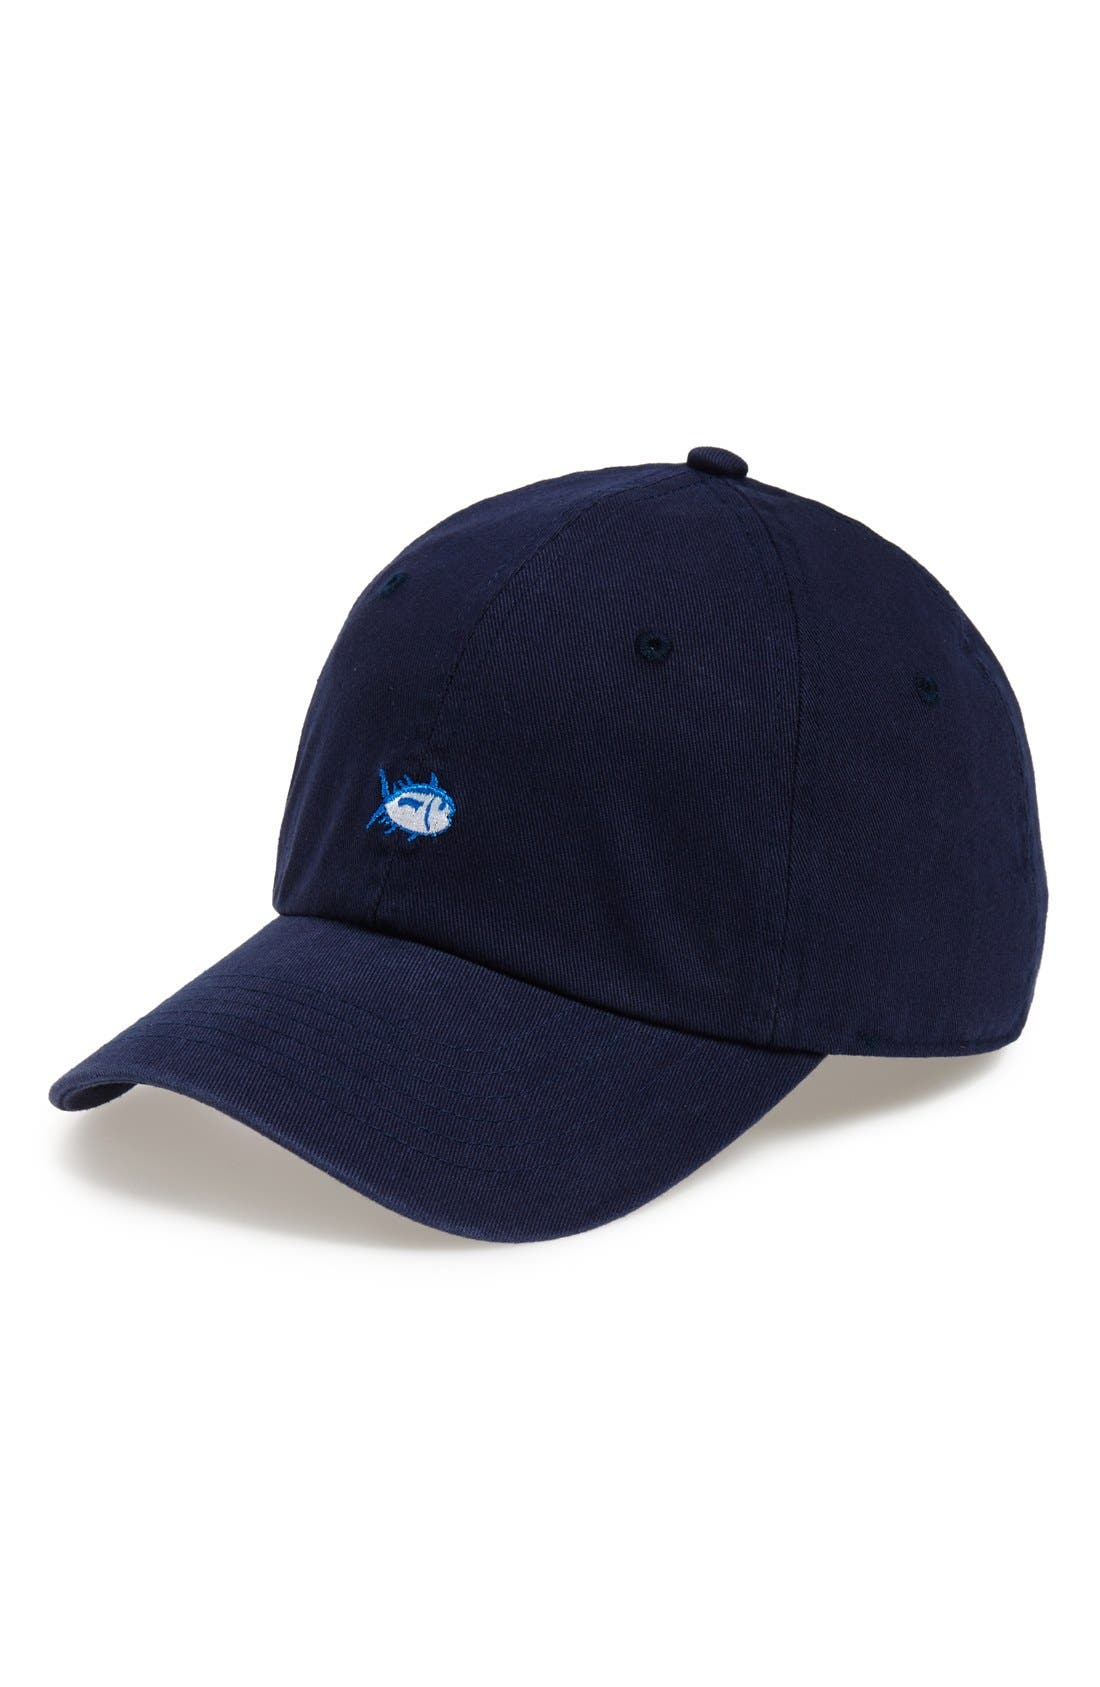 Alternate Image 1 Selected - Southern Tide 'Mini Skipjack' Hat